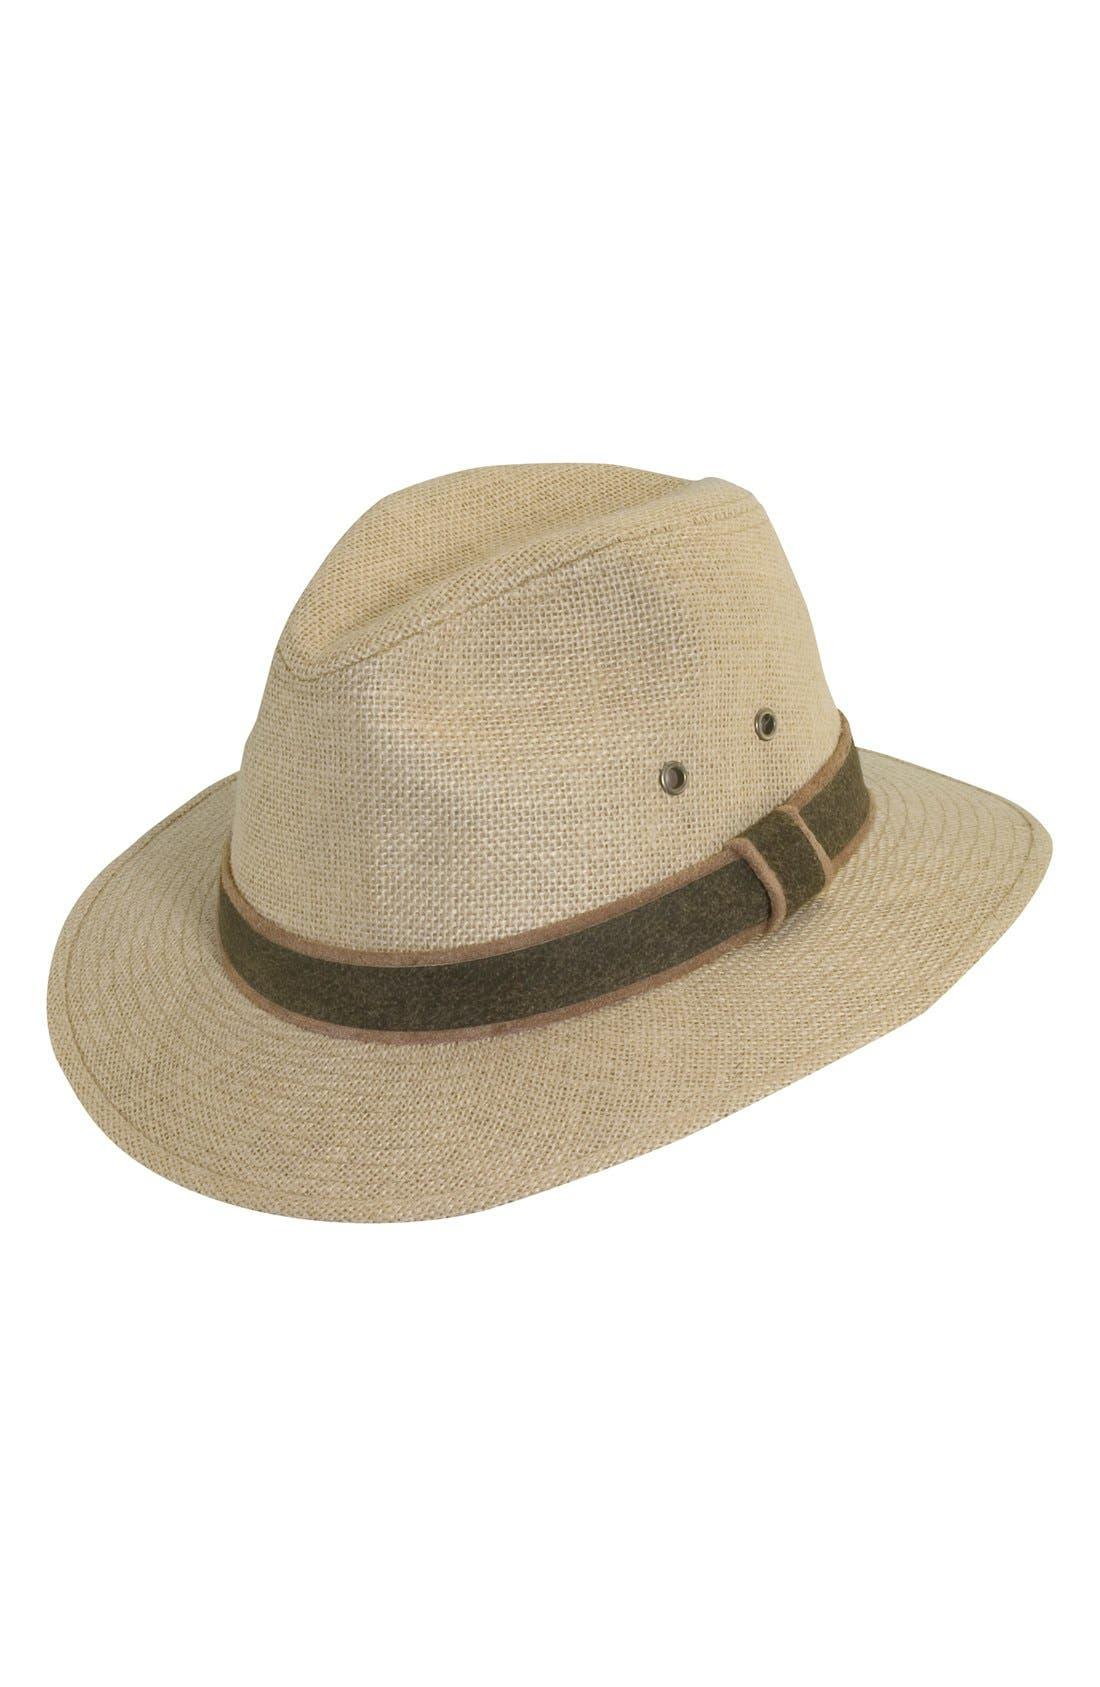 Hemp Safari Hat,                         Main,                         color, Camel